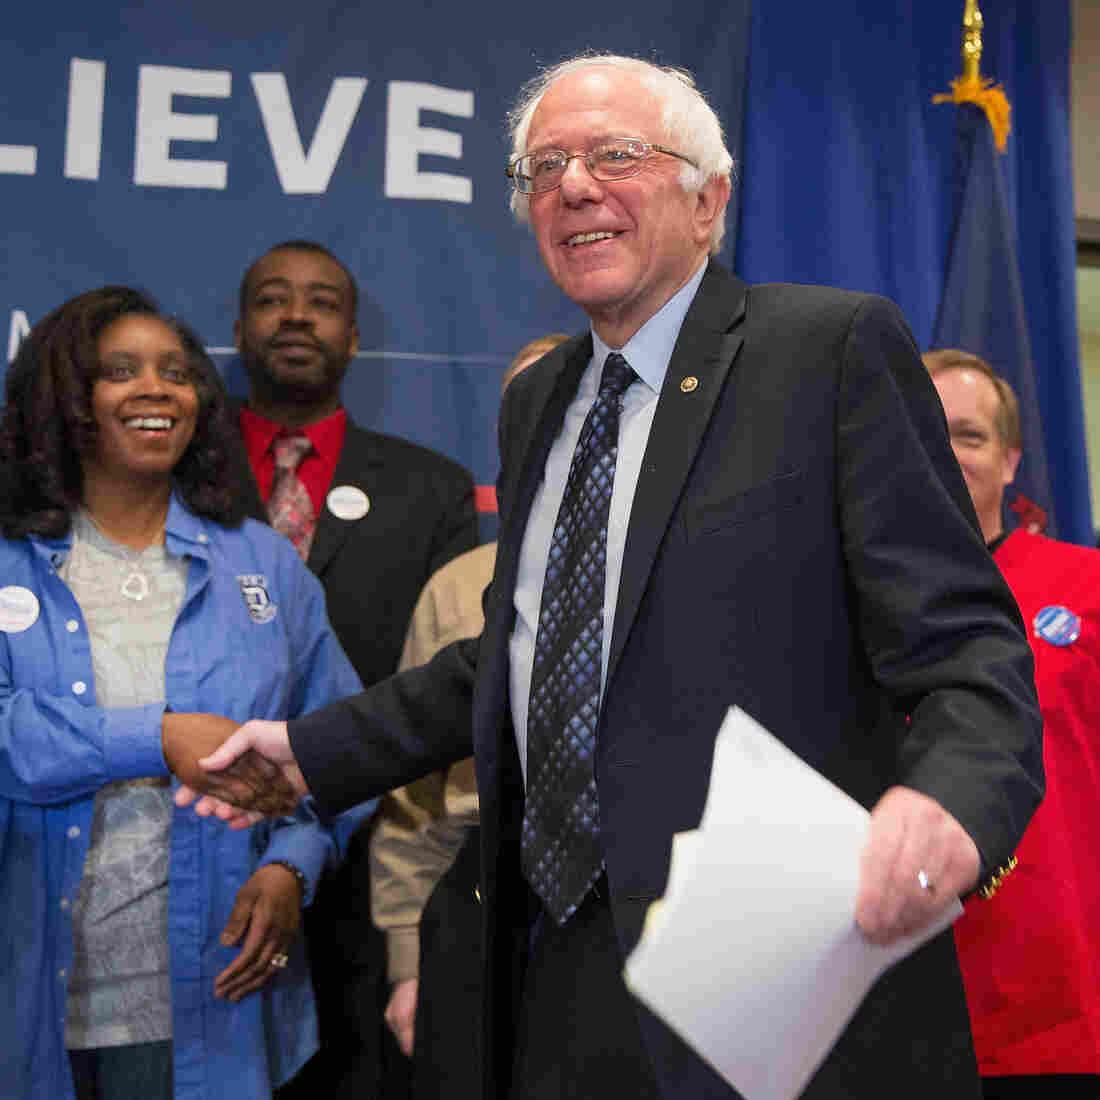 Fact-Check: Bernie Sanders, Abandoned Buildings And NAFTA